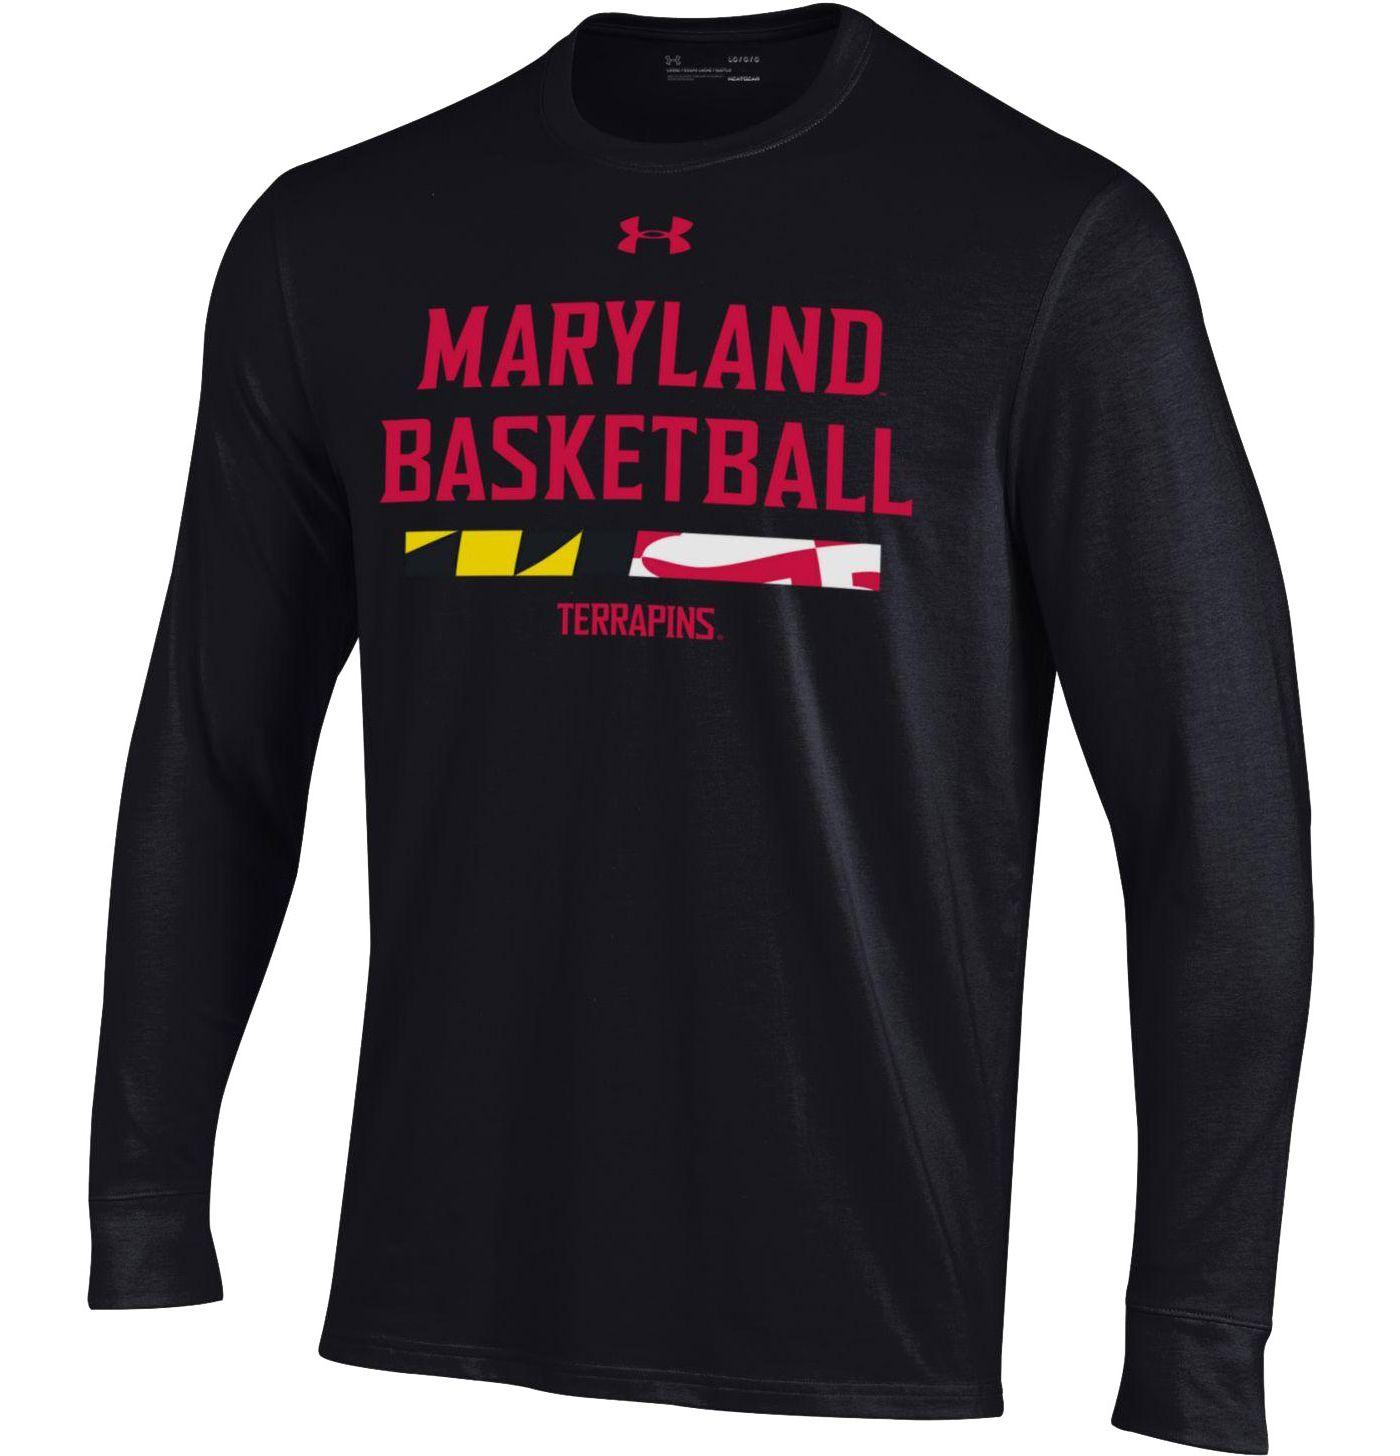 Under Armour Men's Maryland Terrapins On-Court Performance Cotton Long Sleeve Basketball Black T-Shirt